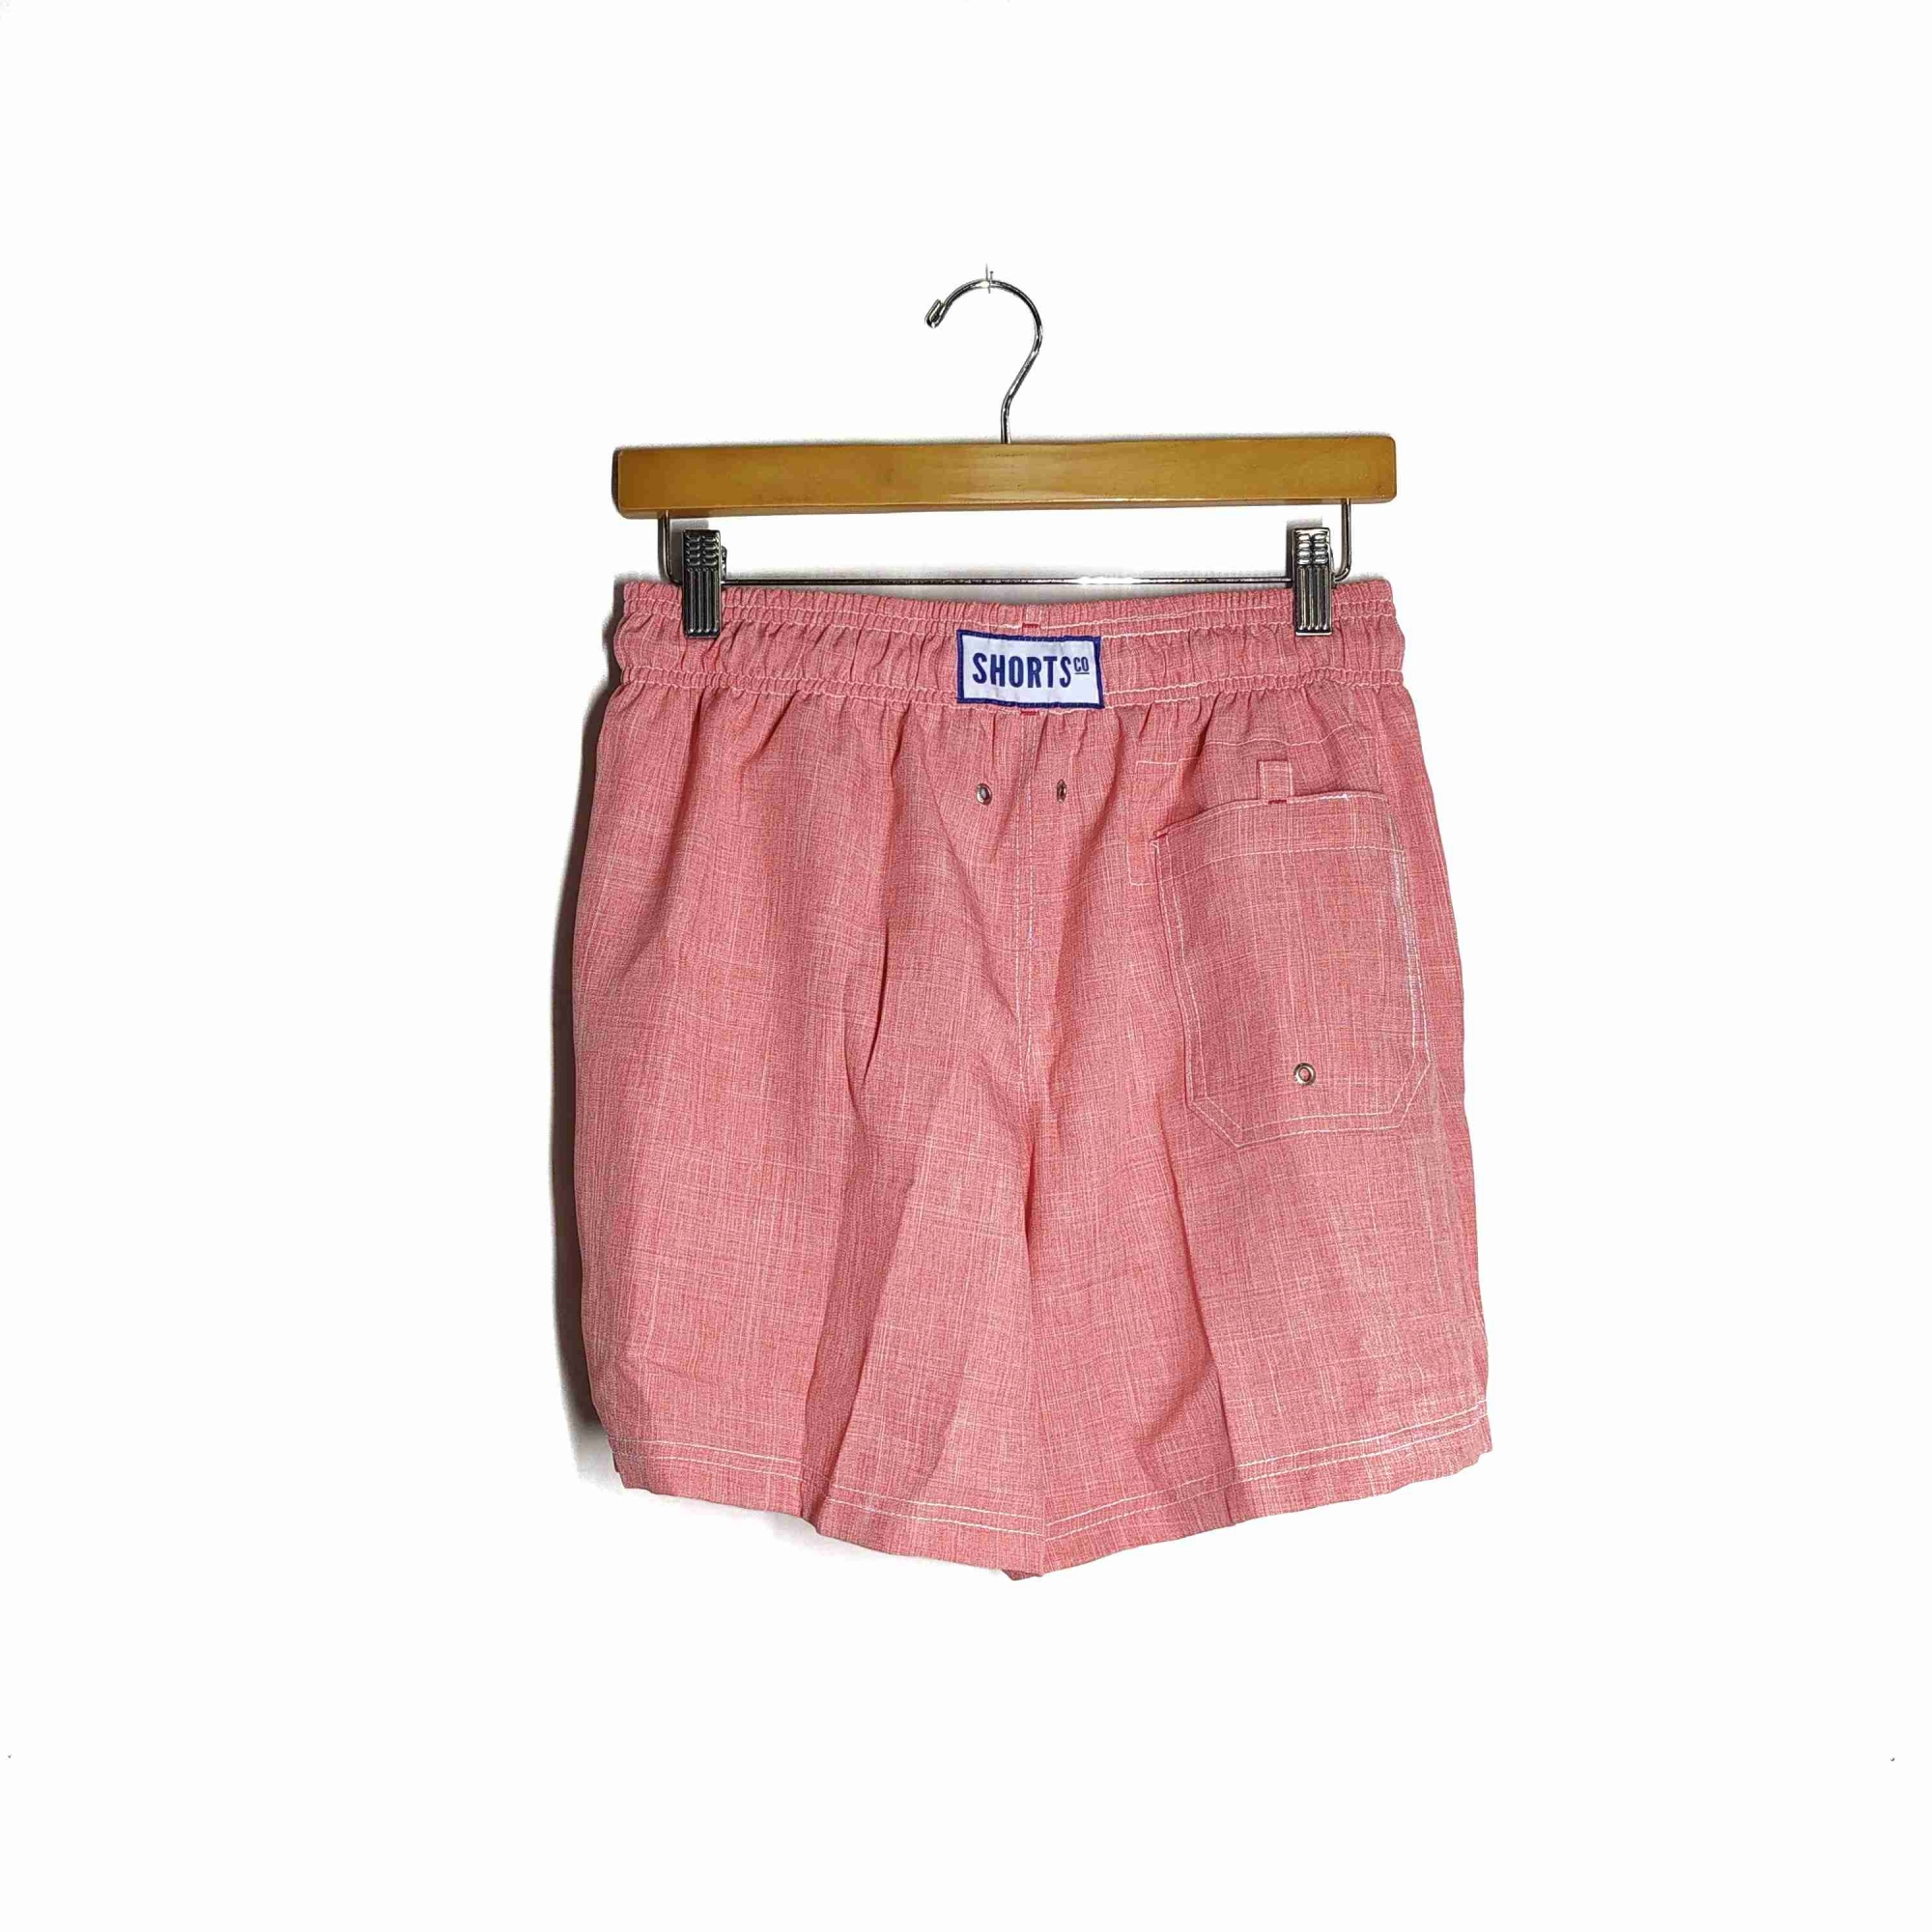 Shorts Co Shorts Oxford Goiaba Adulto